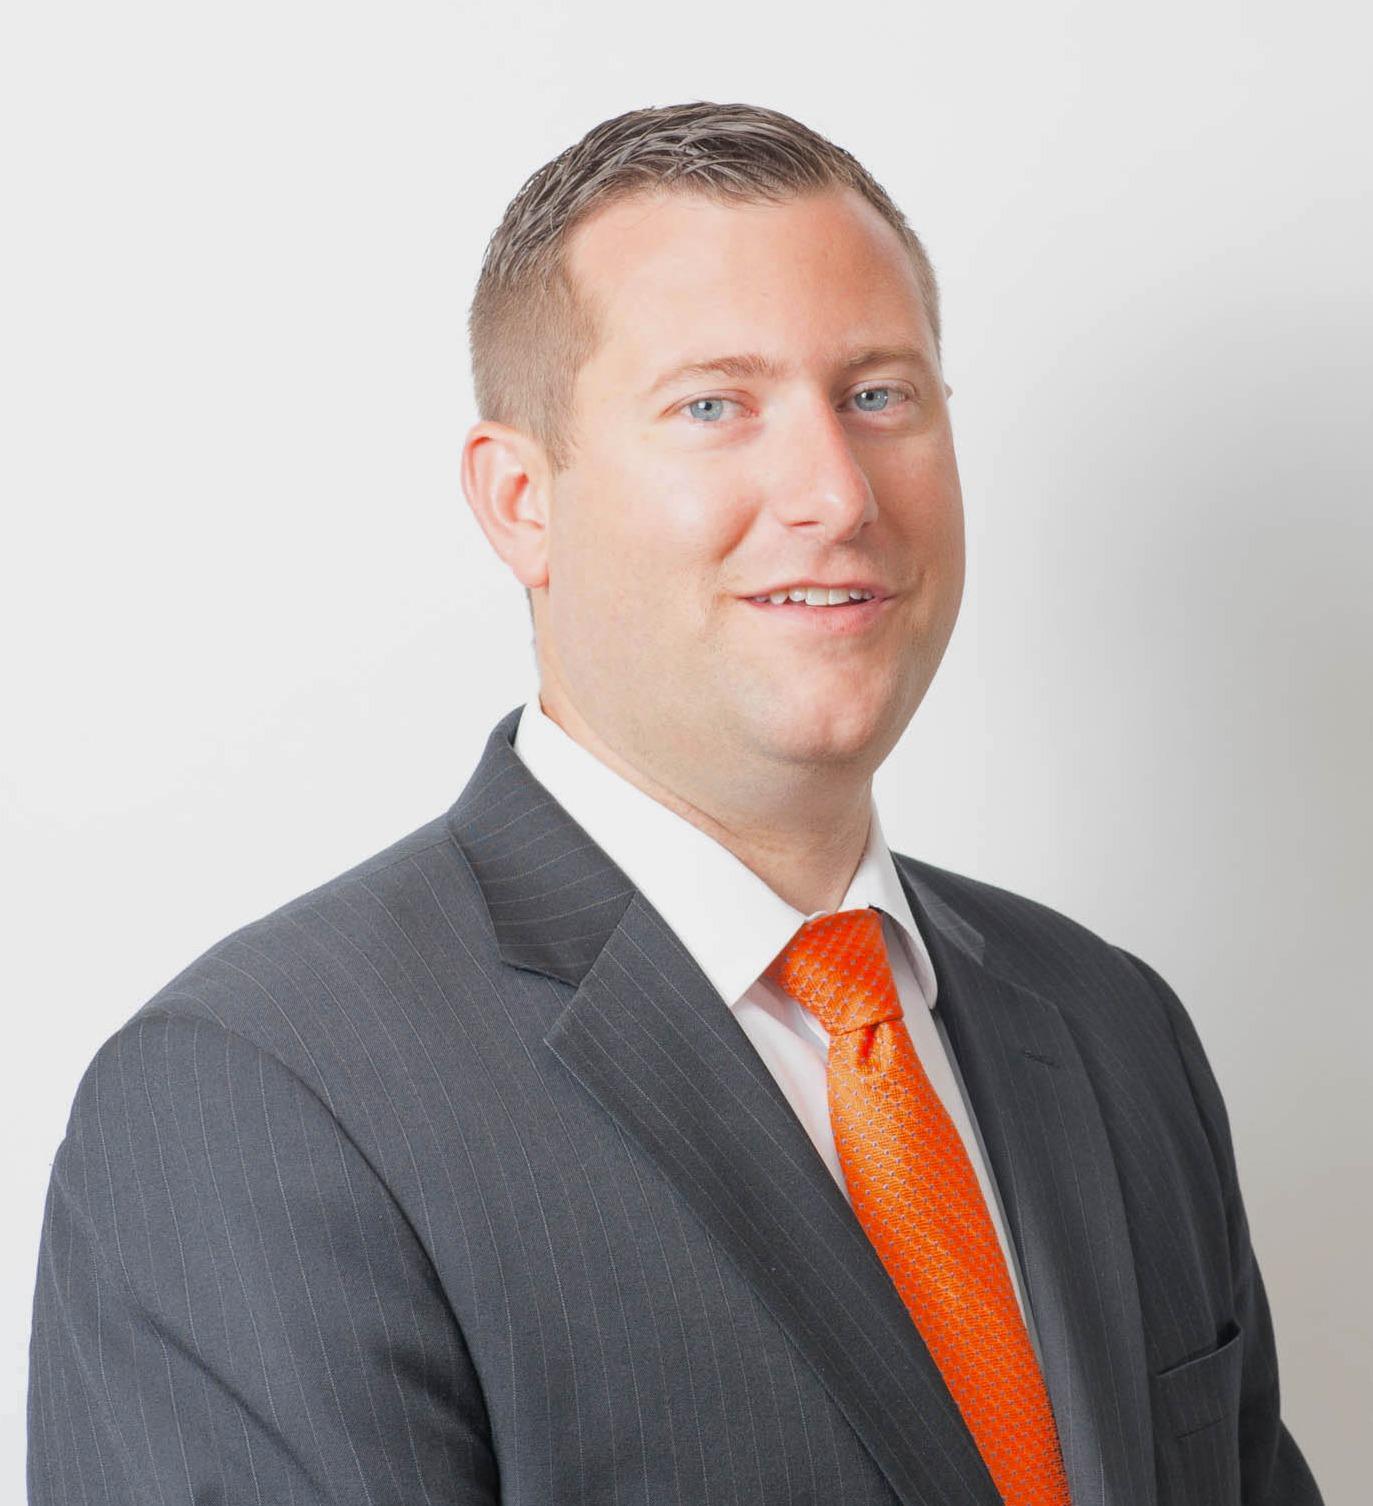 Michael J  DeVries   Chicago, IL   Morgan Stanley Wealth